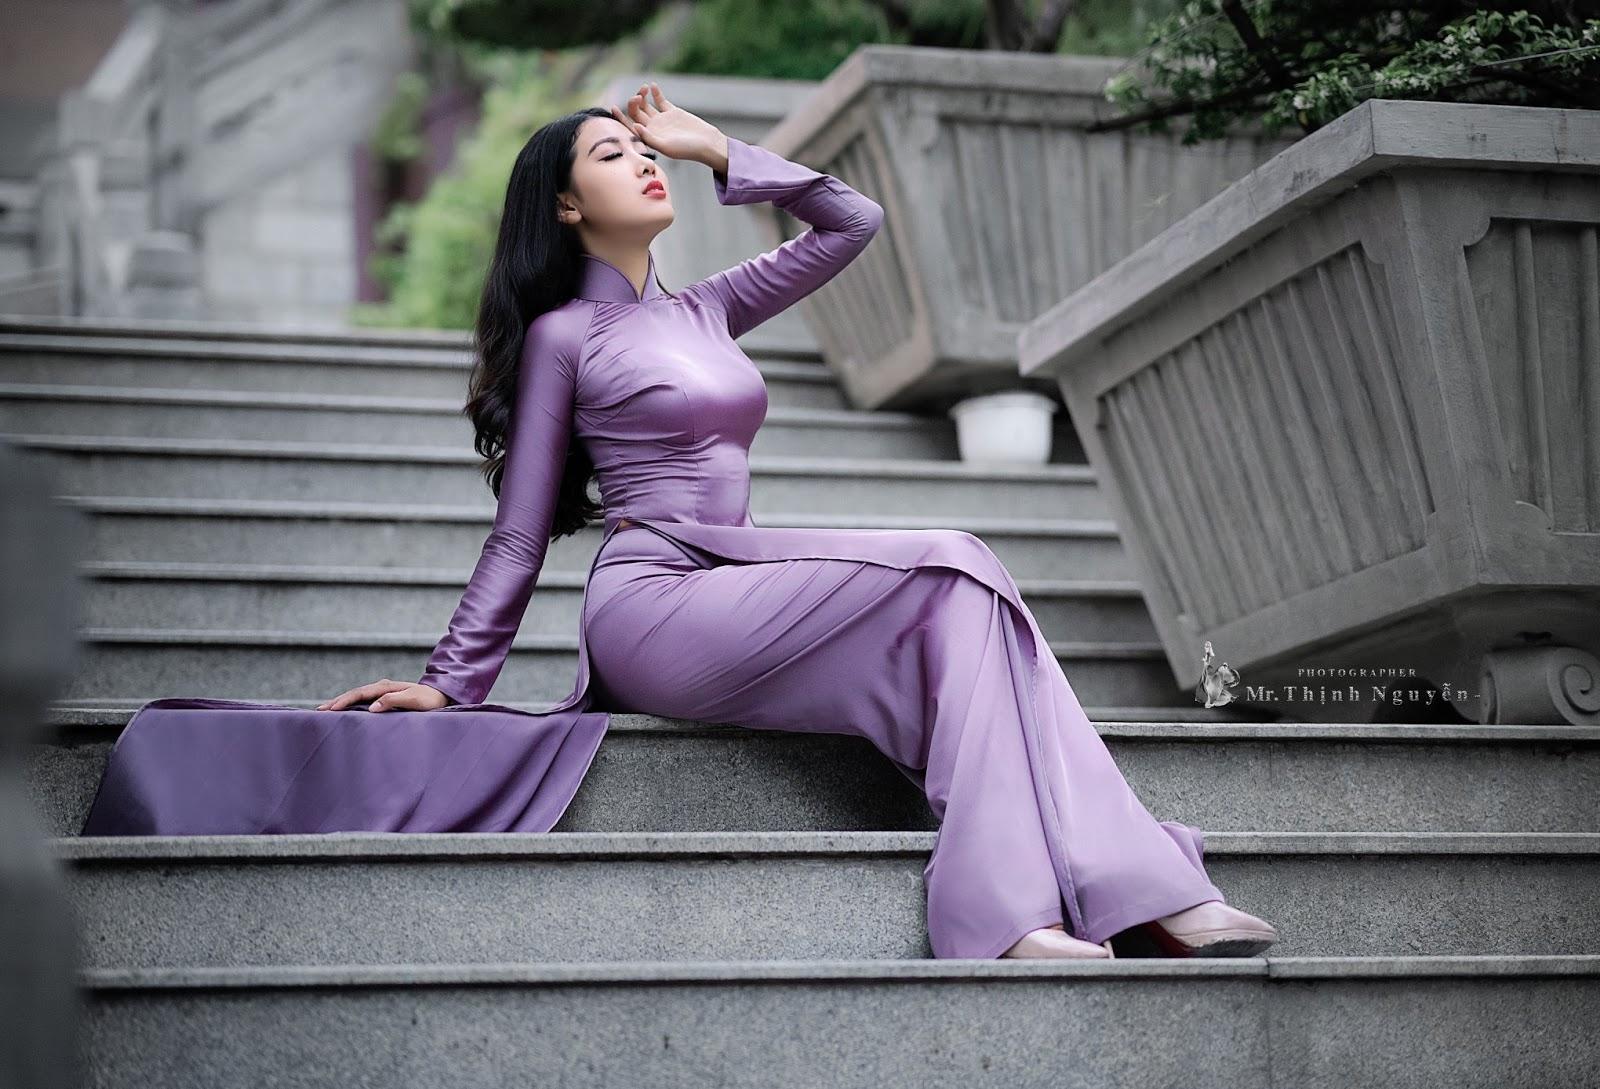 The Girl In Áo dài, Look So Hot (21) Buy Quyen